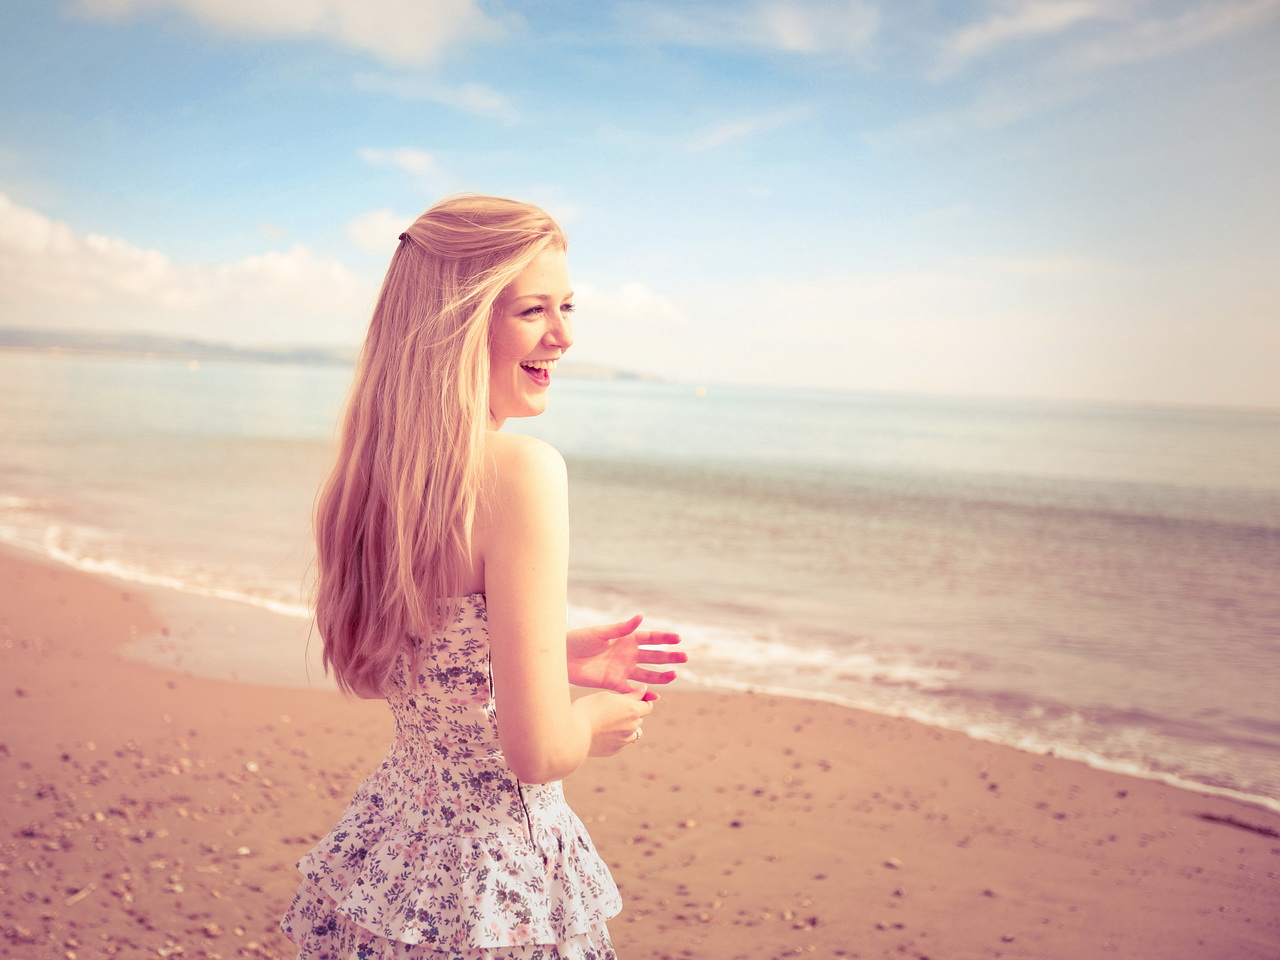 Картинки девушек летом на пляже